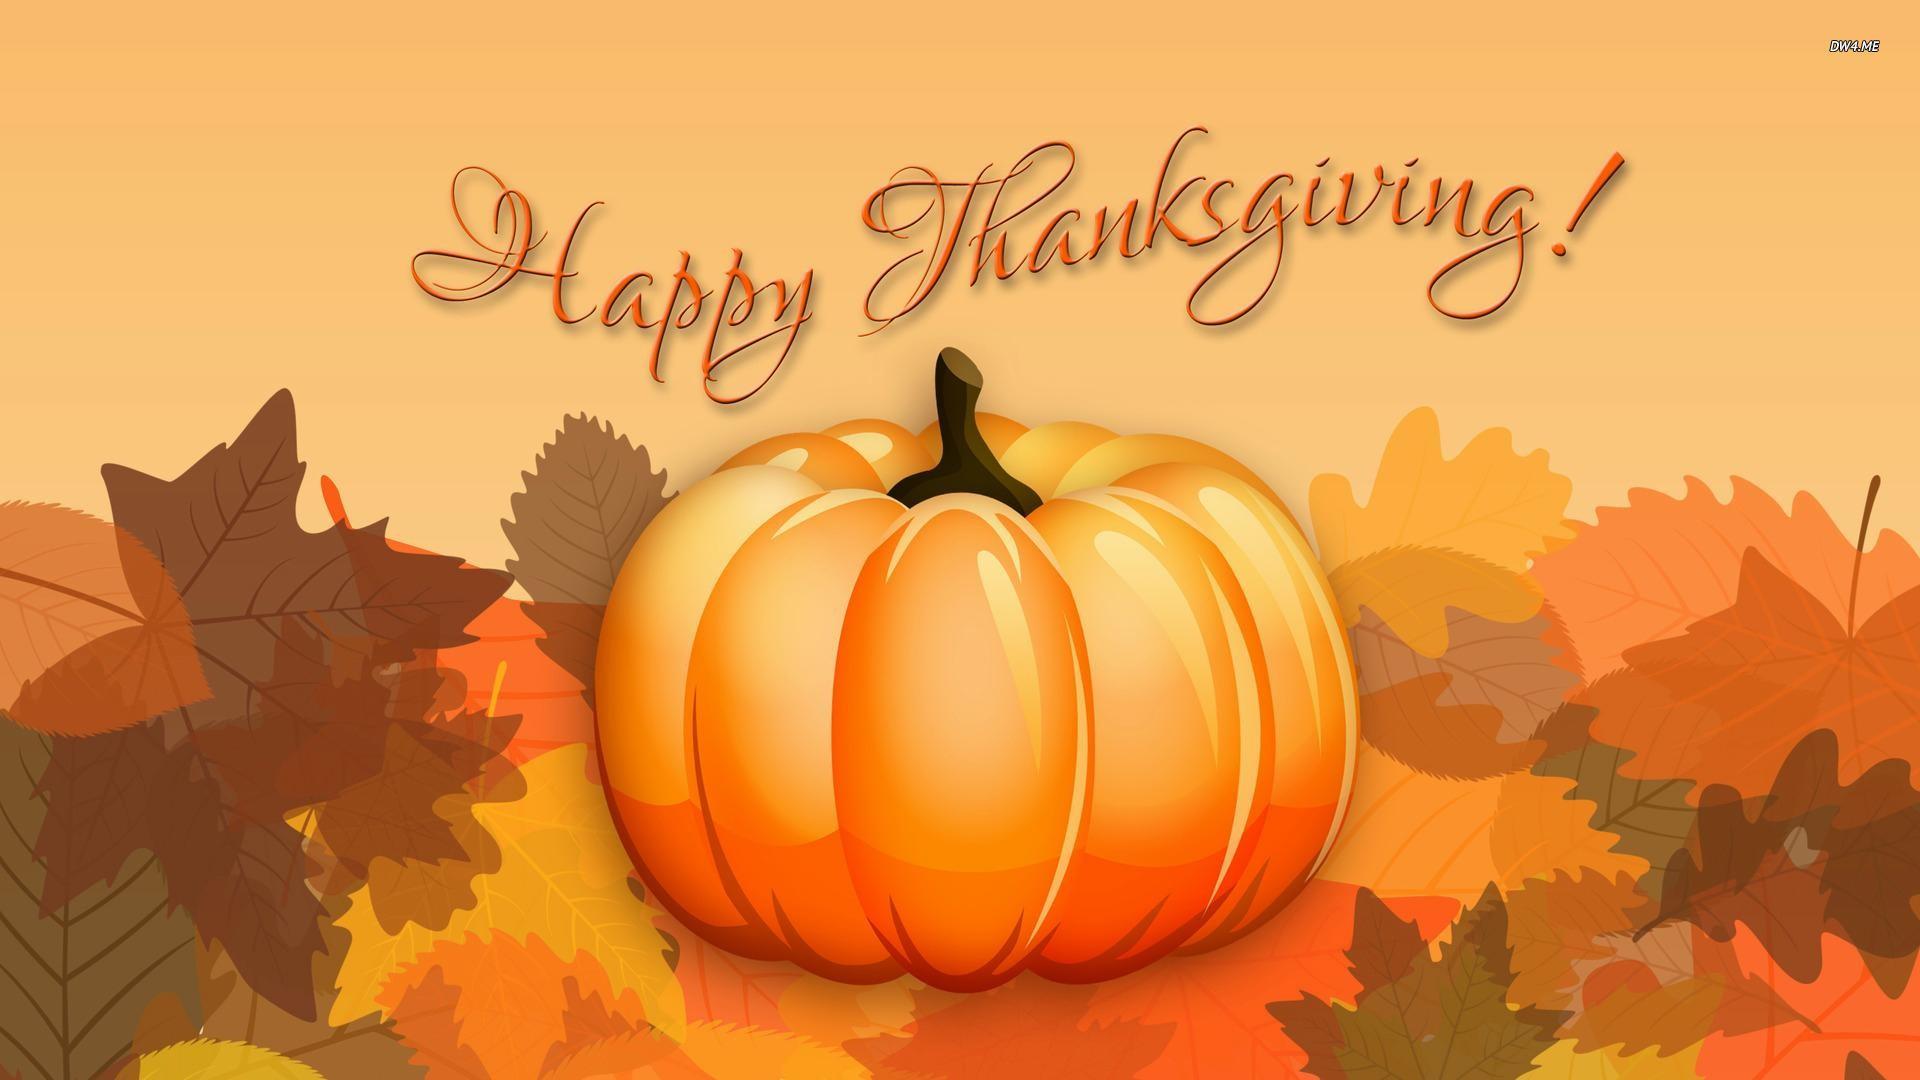 Thanksgiving Day Wallpapers For Desktop 1920×1080